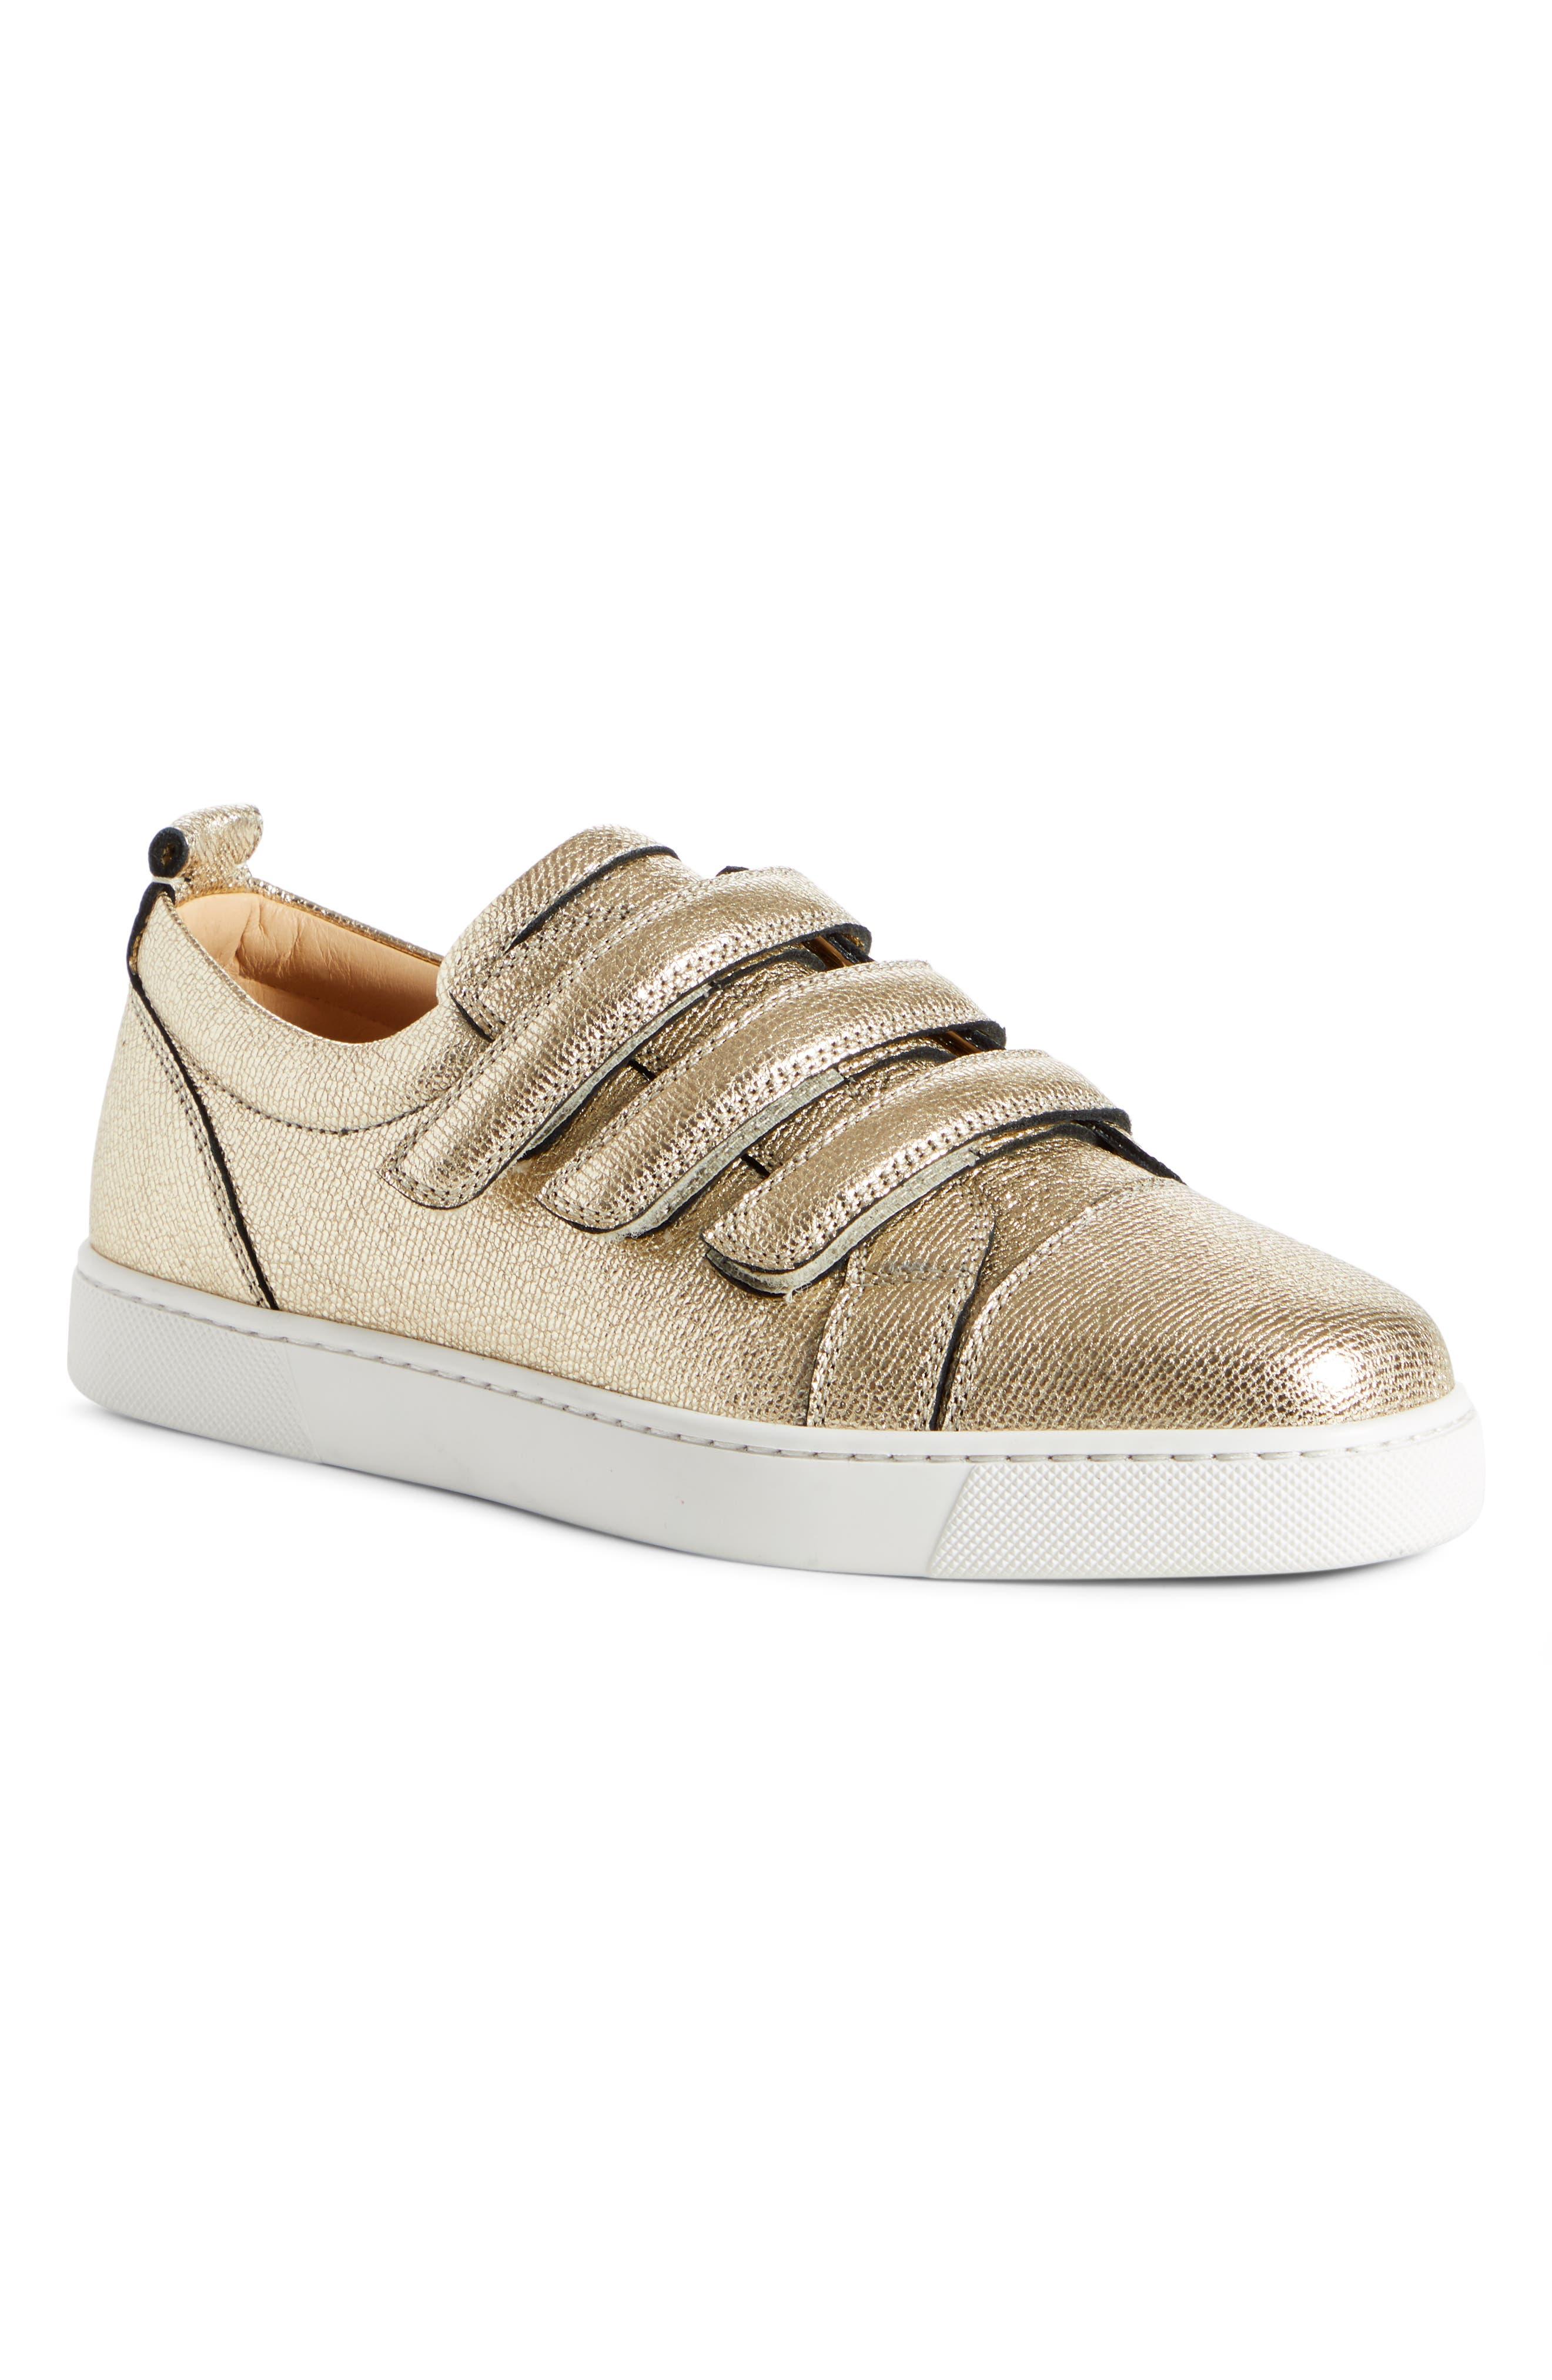 Christian Louboutin Kiddo Donna Three Strap Leather Sneakers